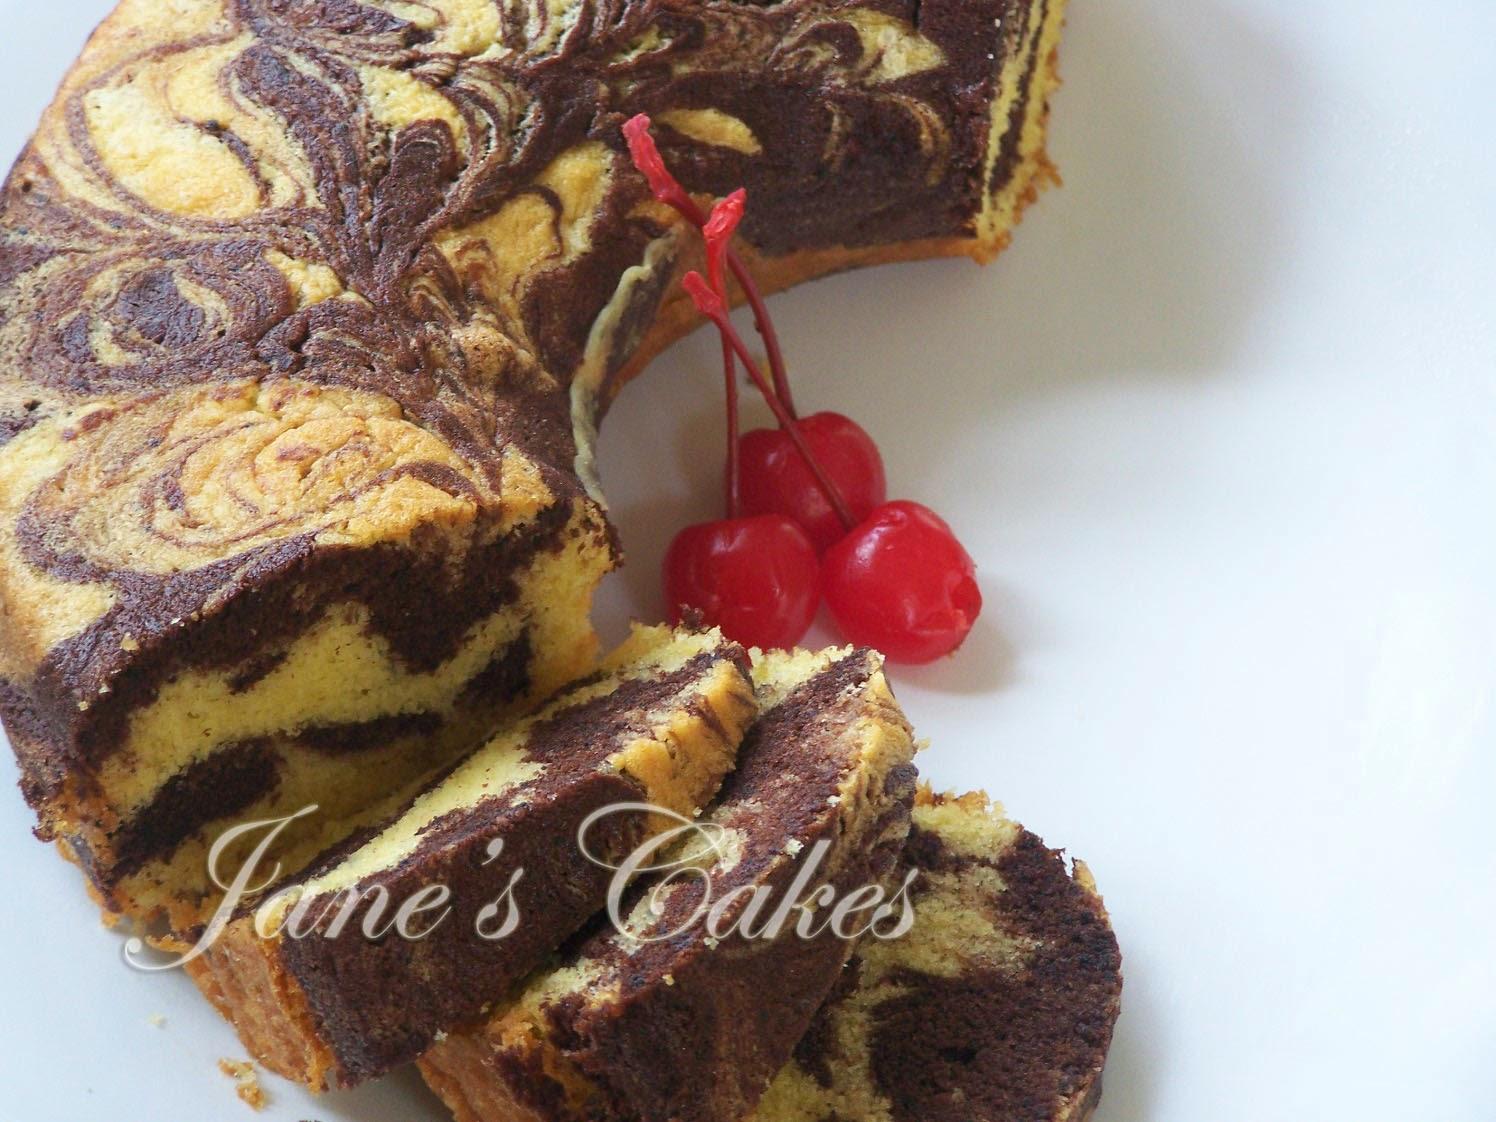 Pin Resep Cake Lebaran Strawberry Cheese Cake on Pinterest